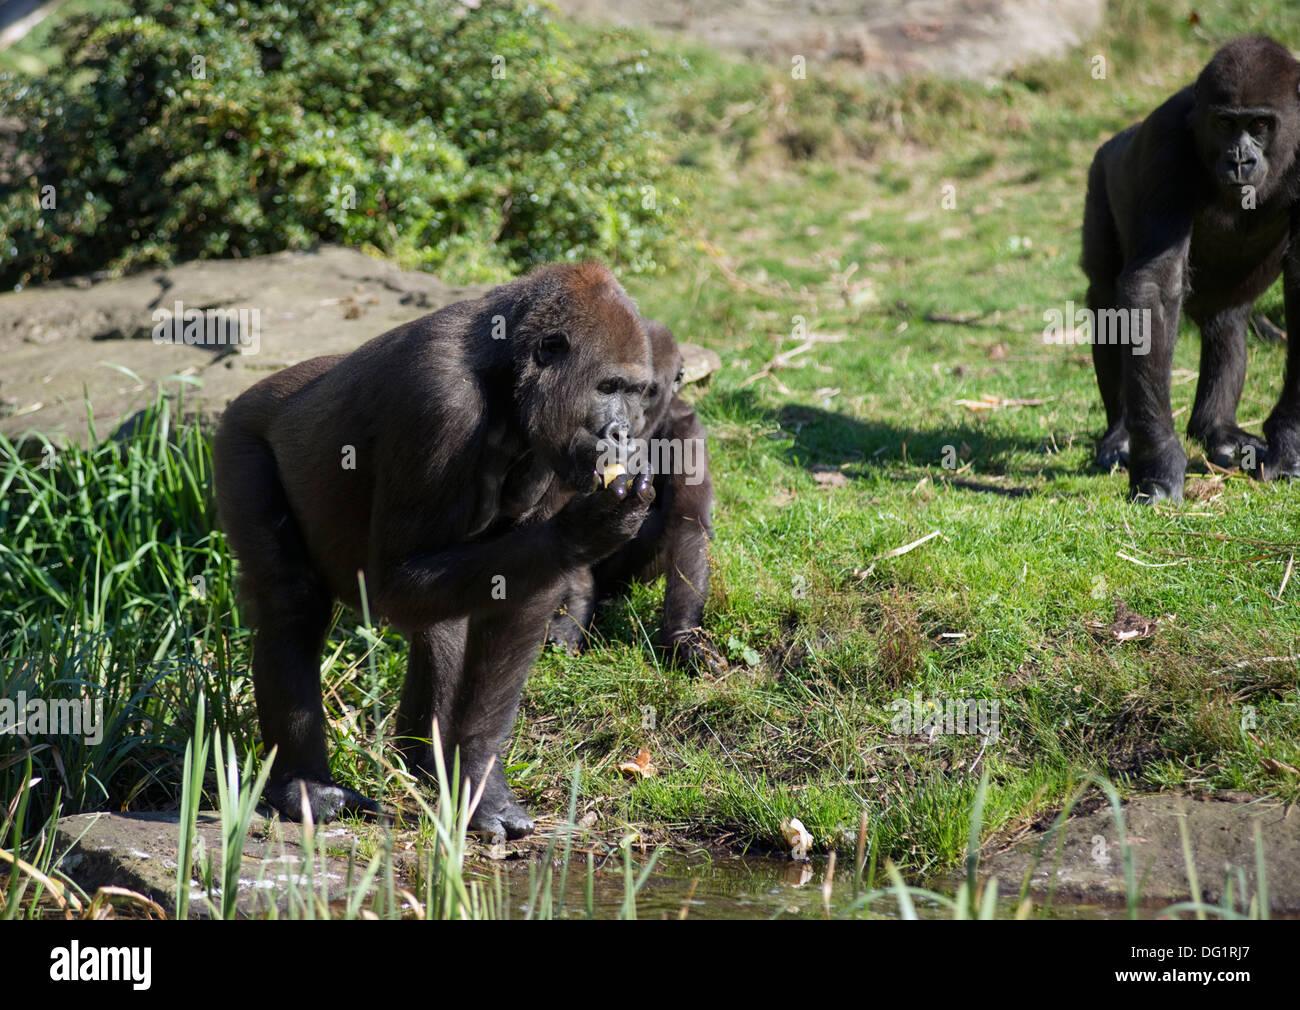 Gorillas at the Apenheul primate park in Apeldoorn, the Netherlands - Stock Image